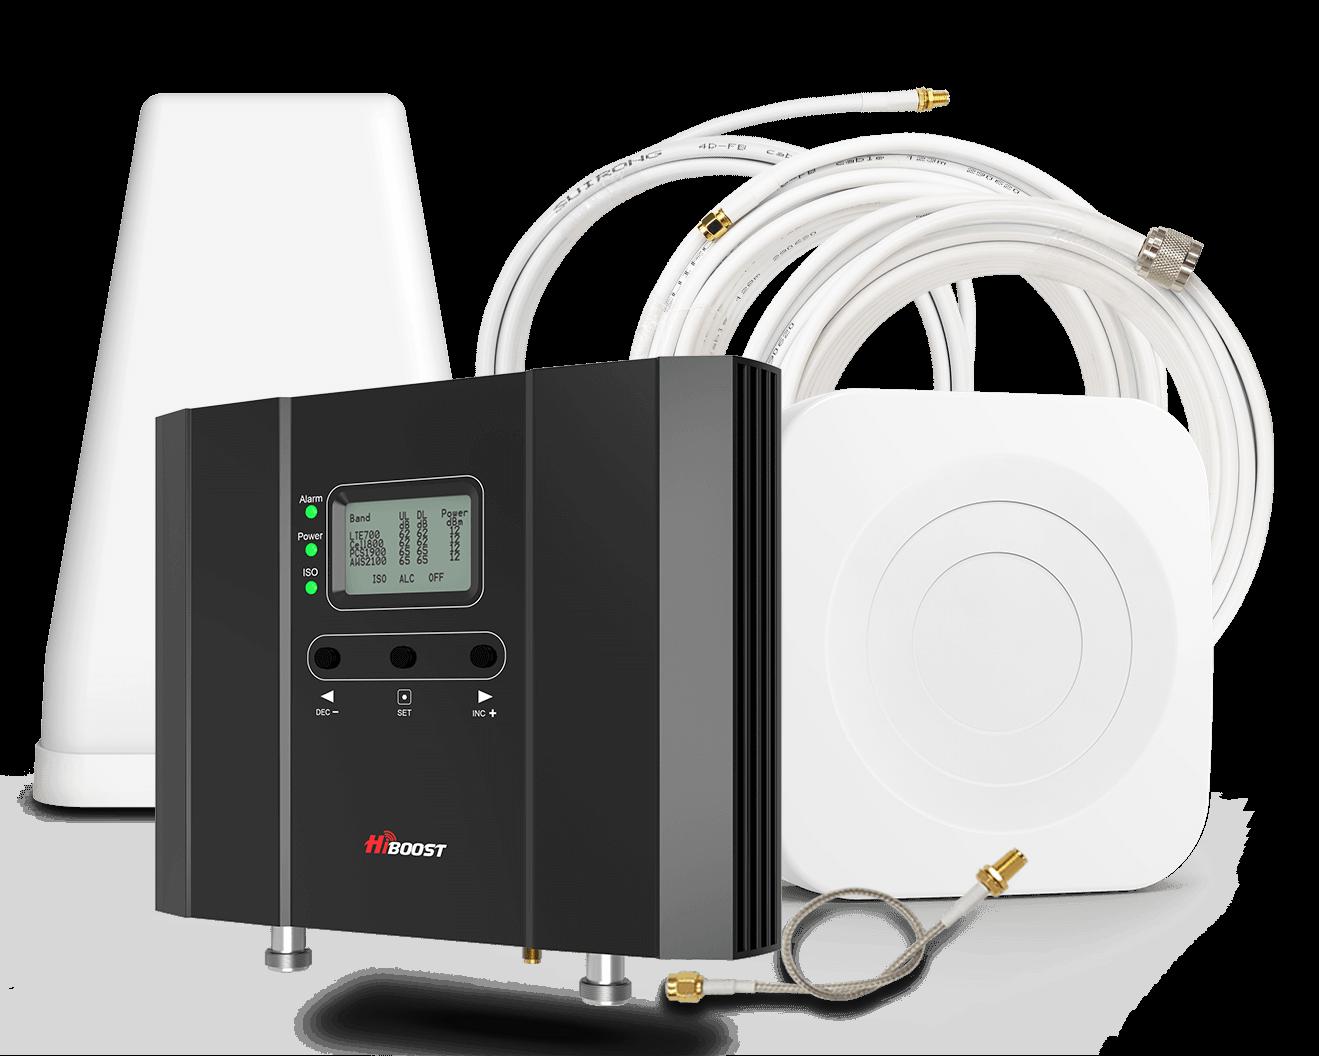 Hiboost-10K-Smart-Link-Signal-Amplifier